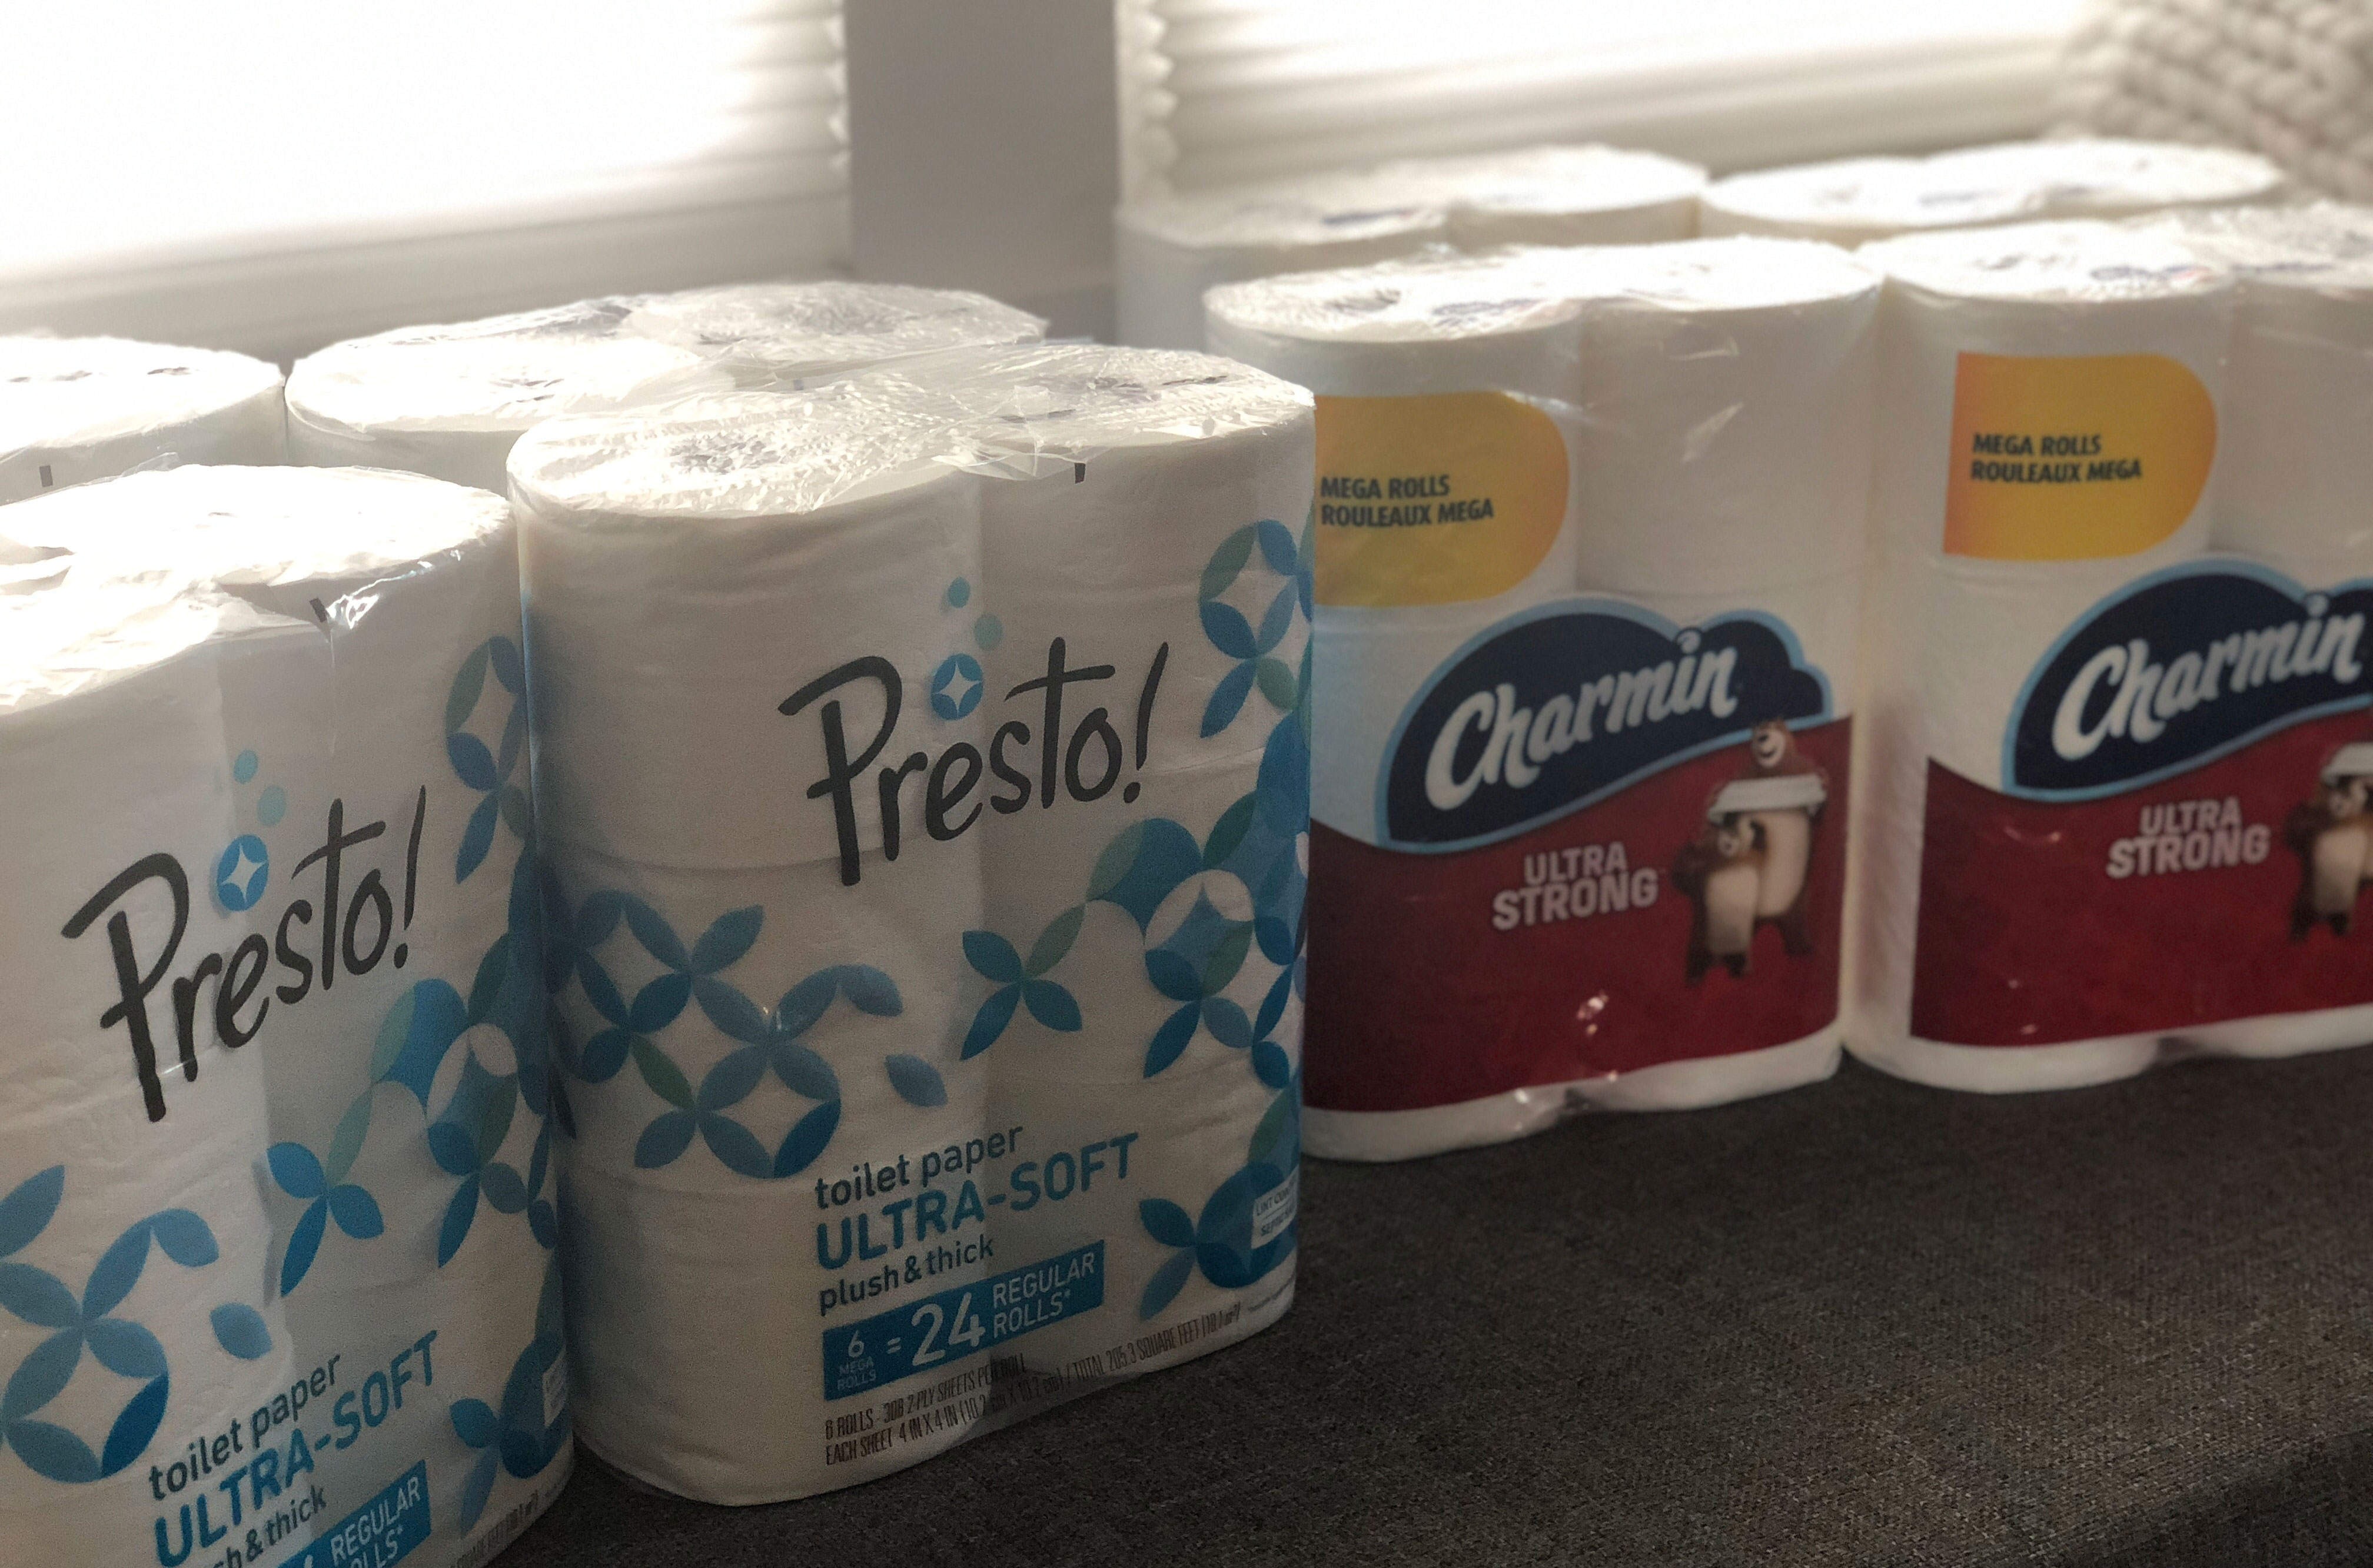 Toilet paper Presto! versus Charmin